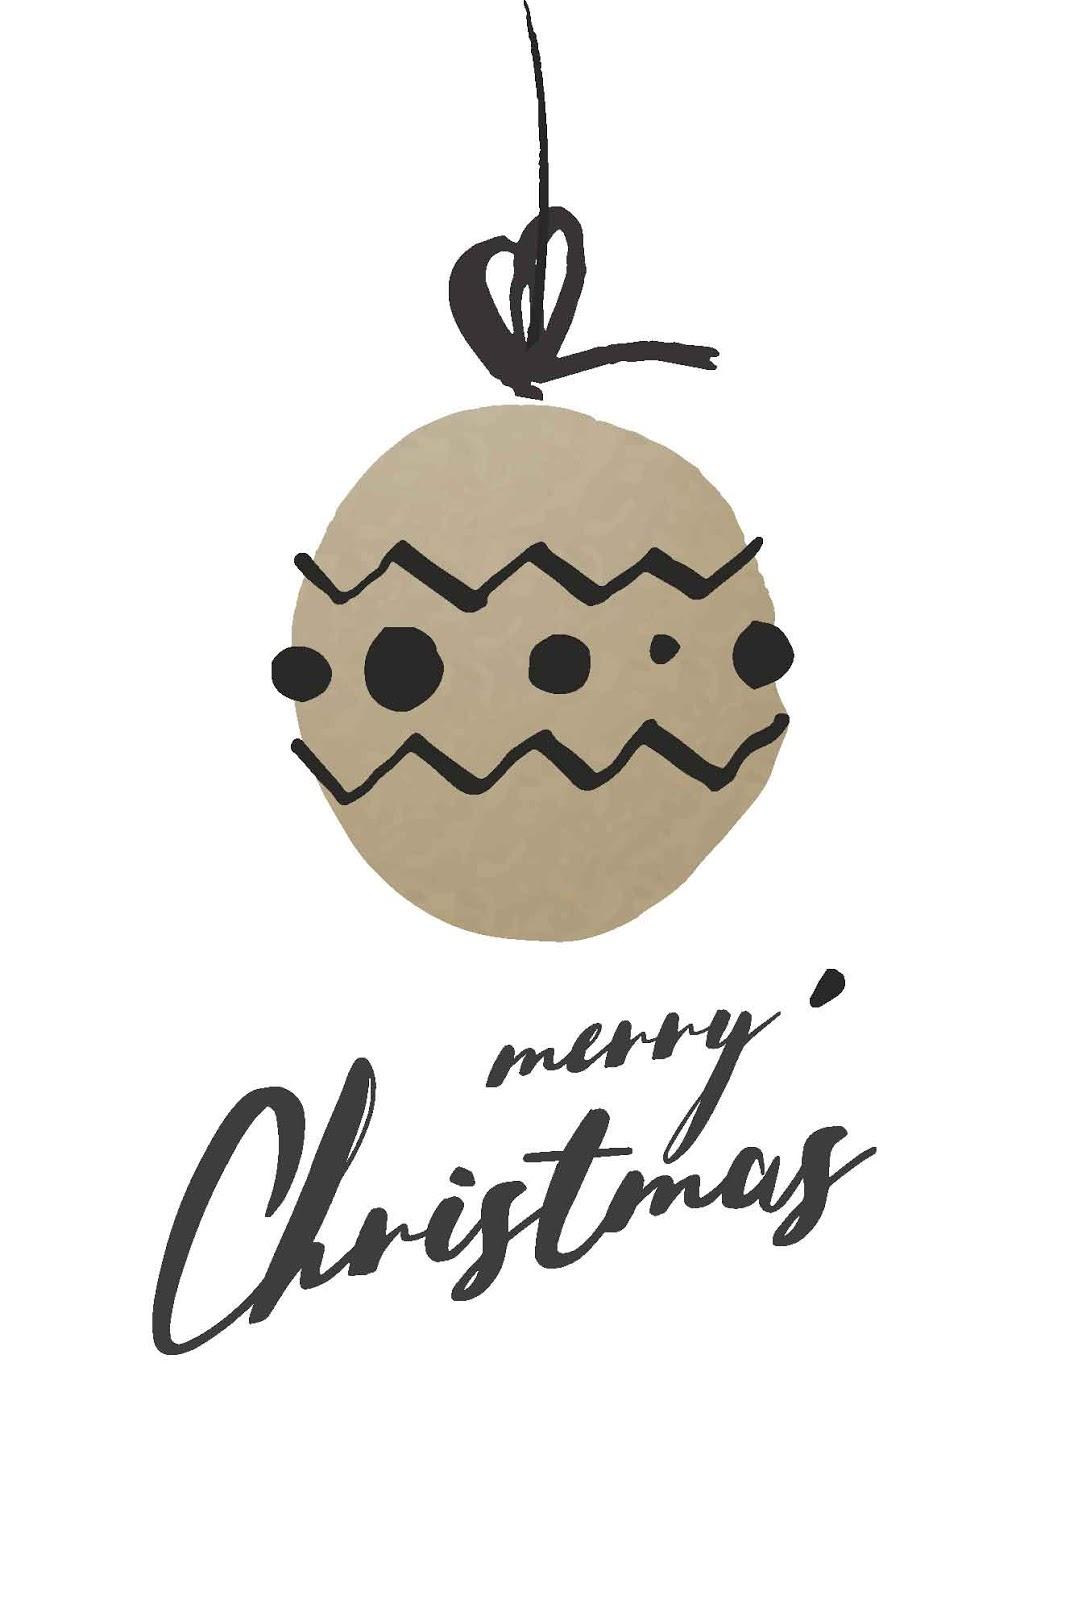 Merry Christmas Card for Print